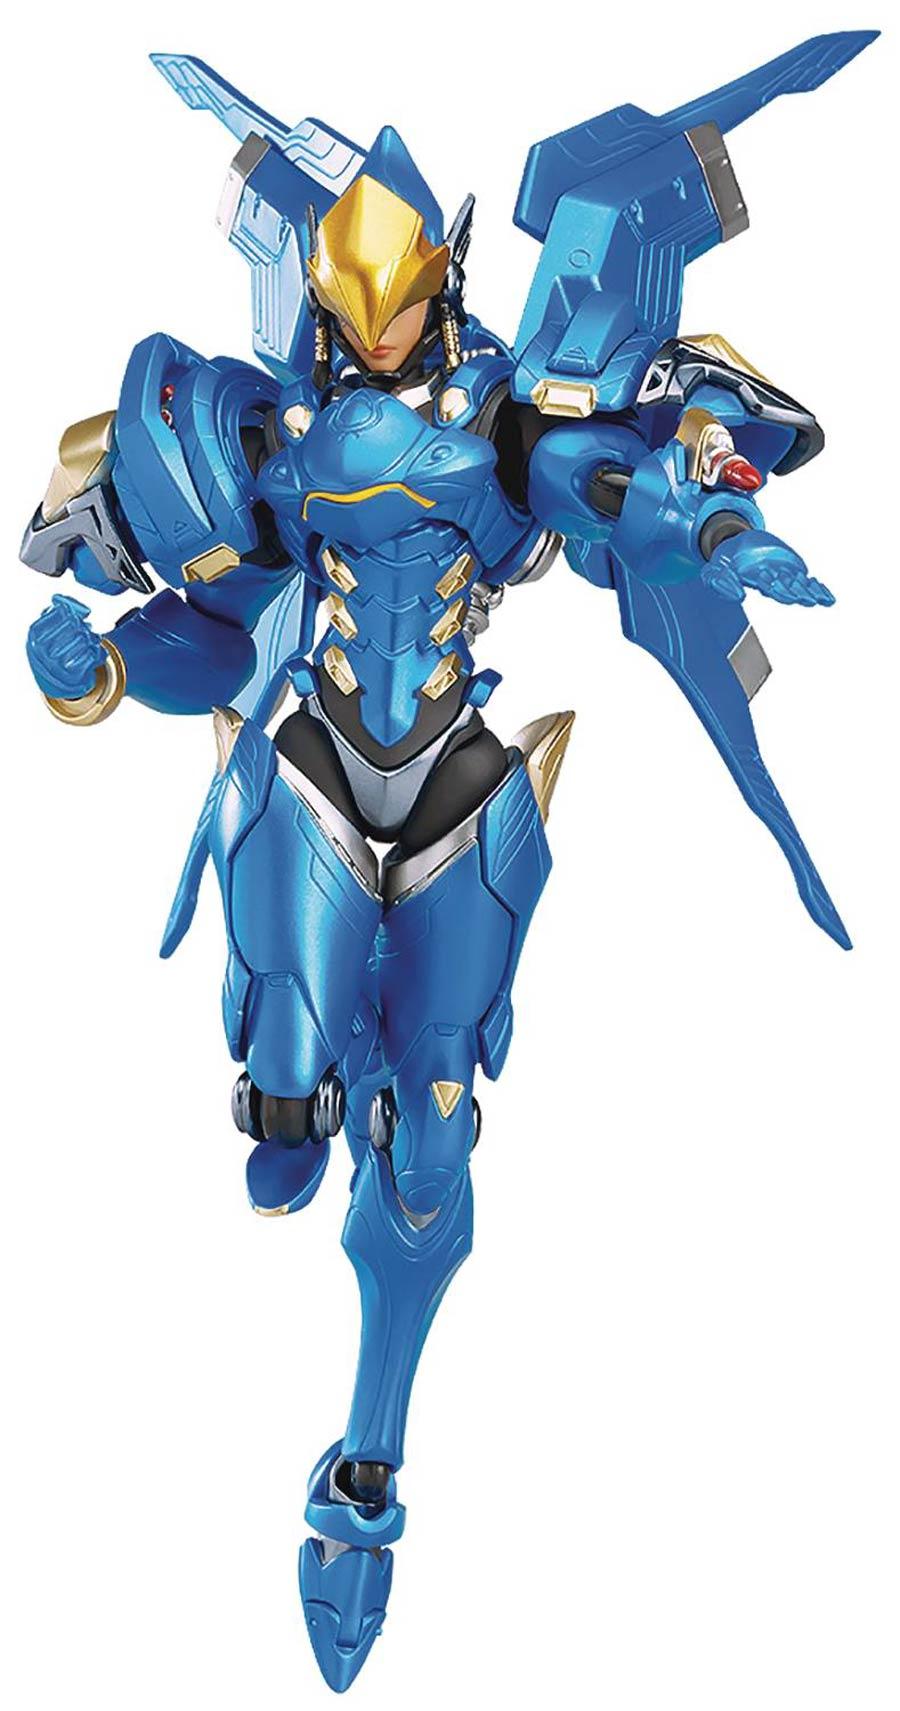 Overwatch Pharah Figma Action Figure